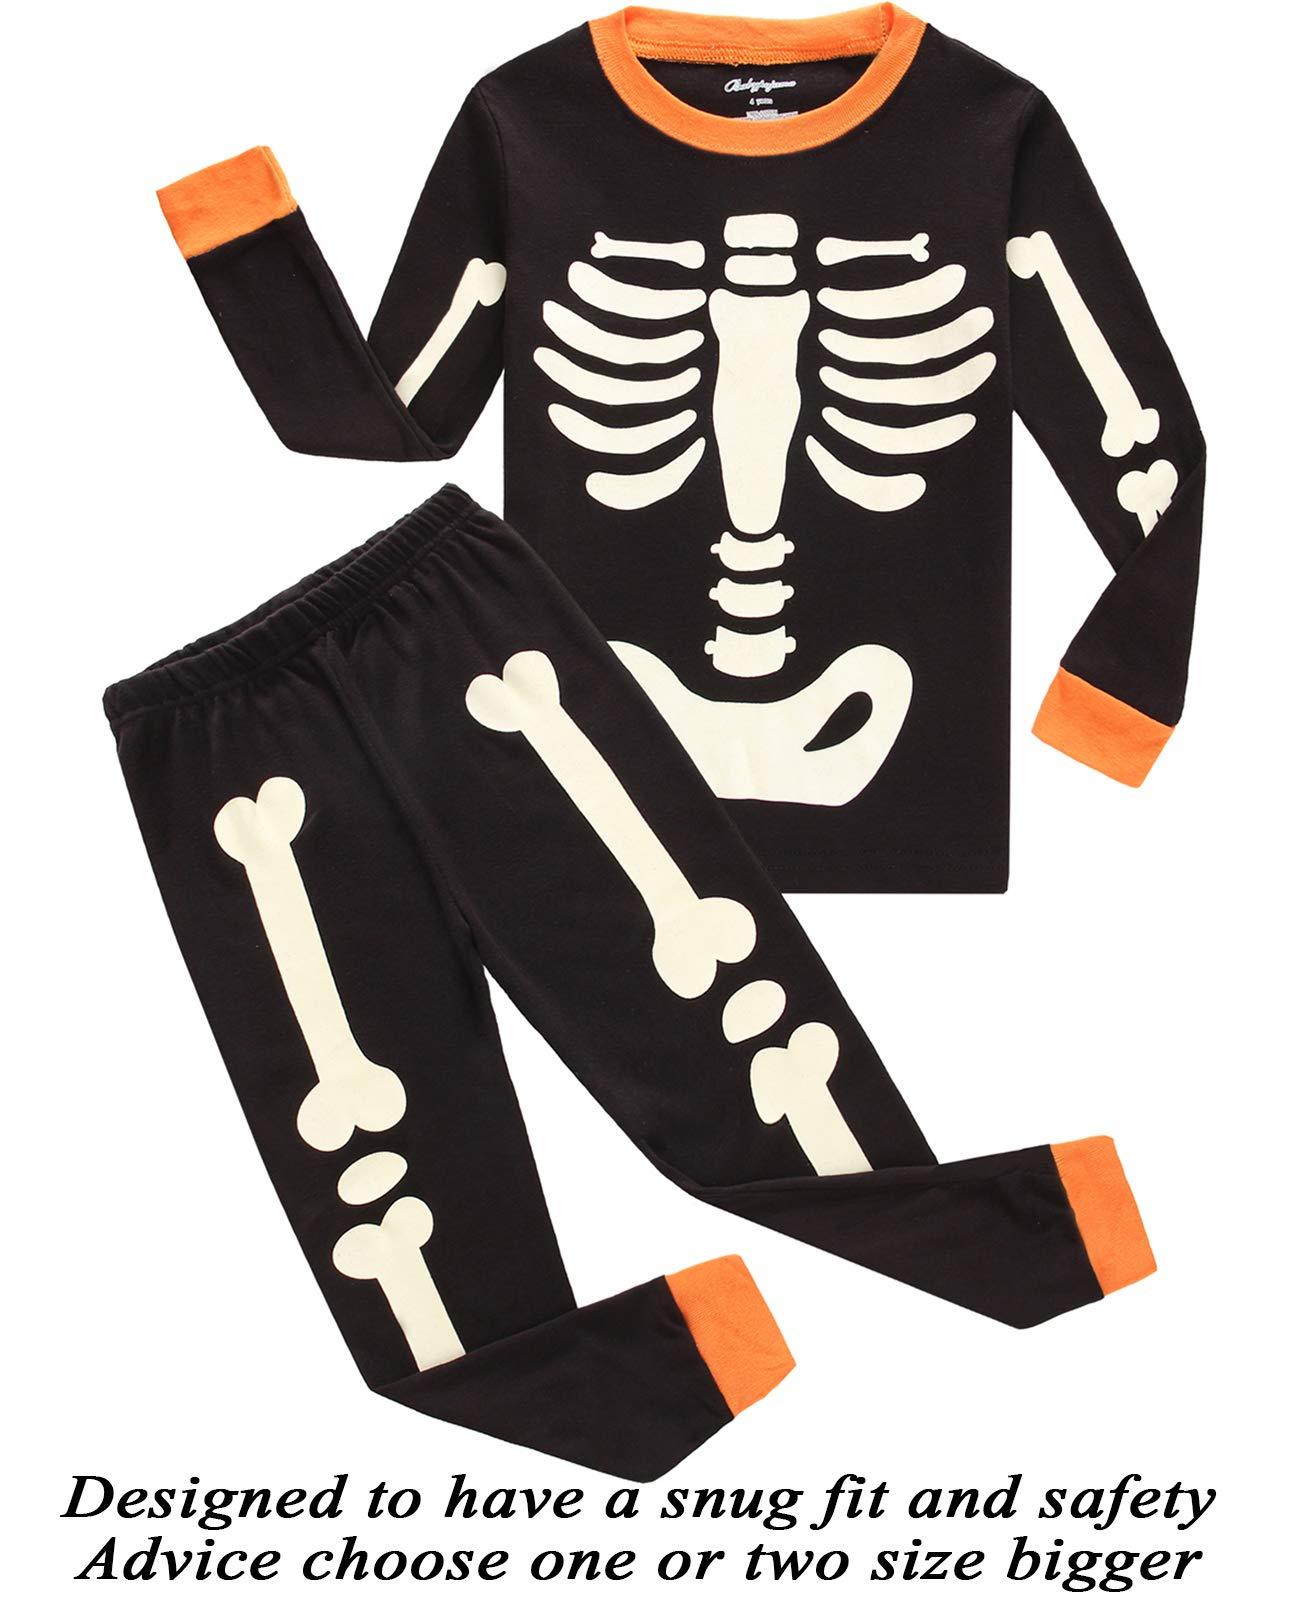 19eebc8e37d3 Galleon - Little Bety 100% Cotton Boys Halloween Pajamas Glow In The ...